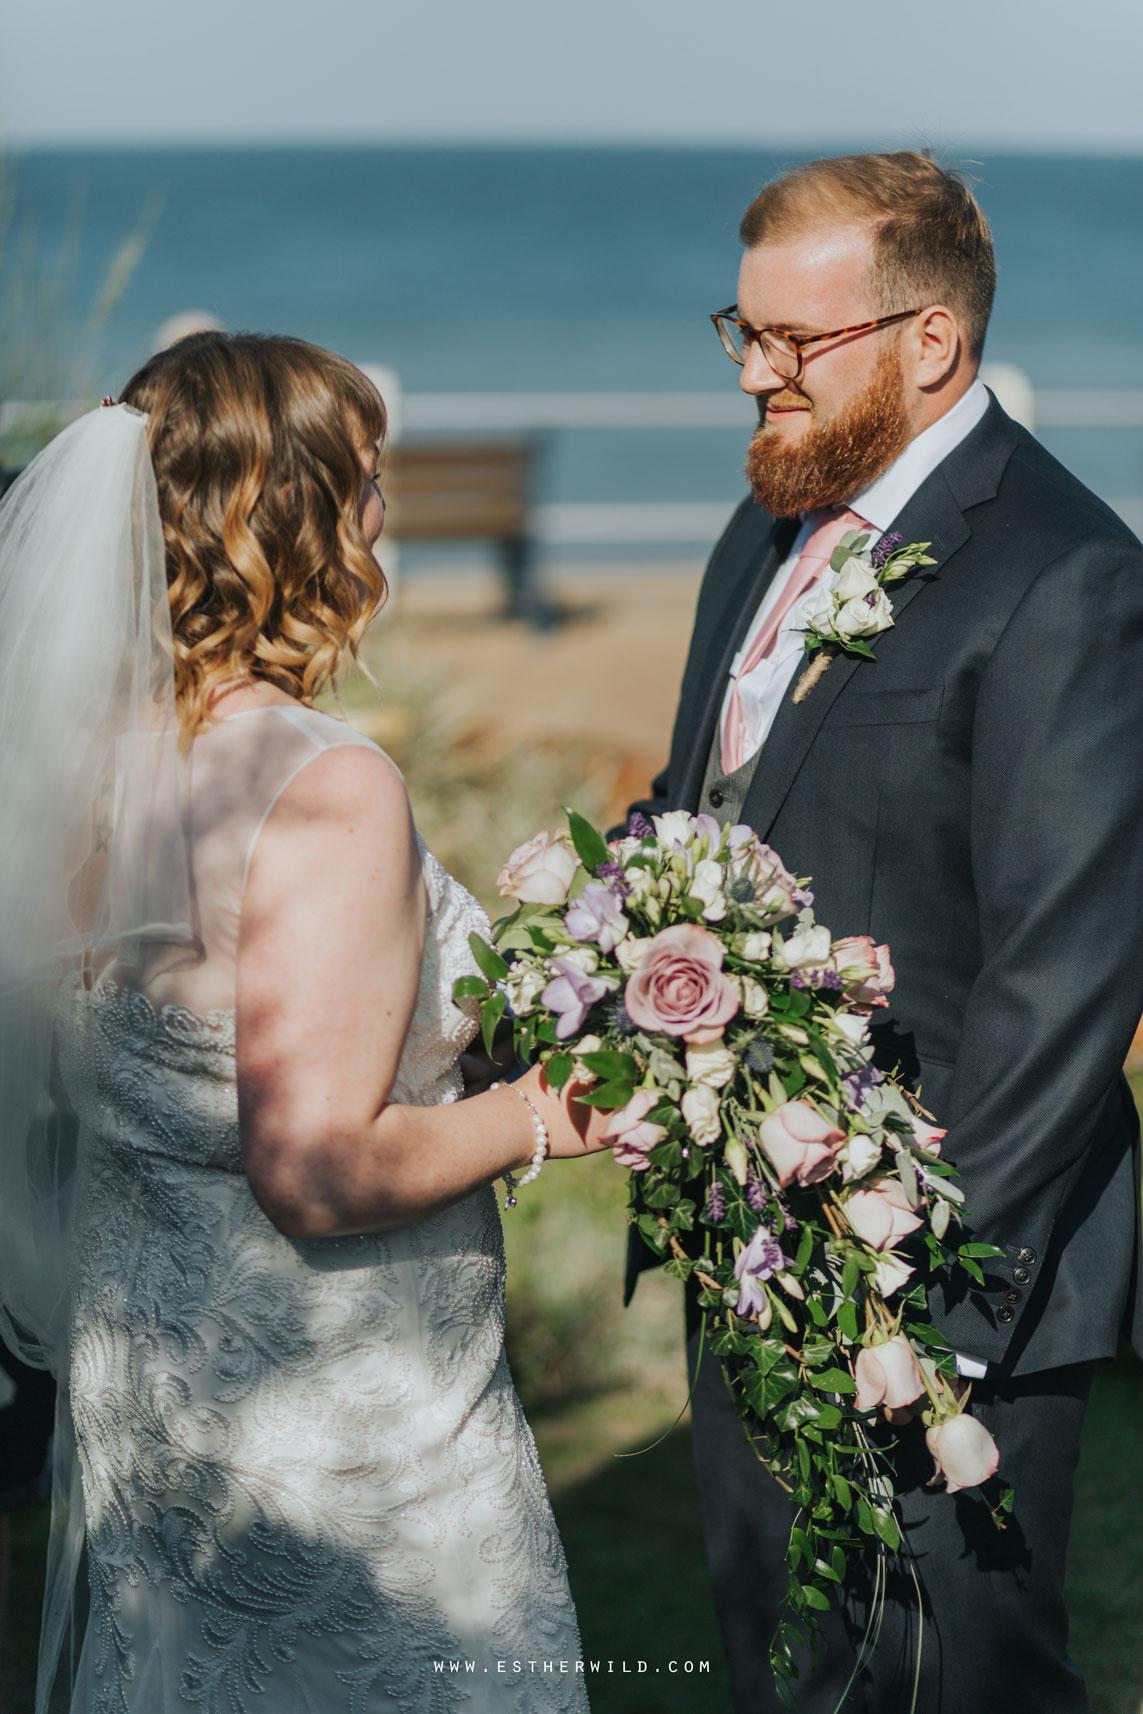 Cromer_Wedding_Beach_Outdoor_Ceremony_Norfolk_North_Lodge_Registry_Office_Rocket_House_Cafe_Cromer_Pier_IMG_3755_IMGL7946.jpg